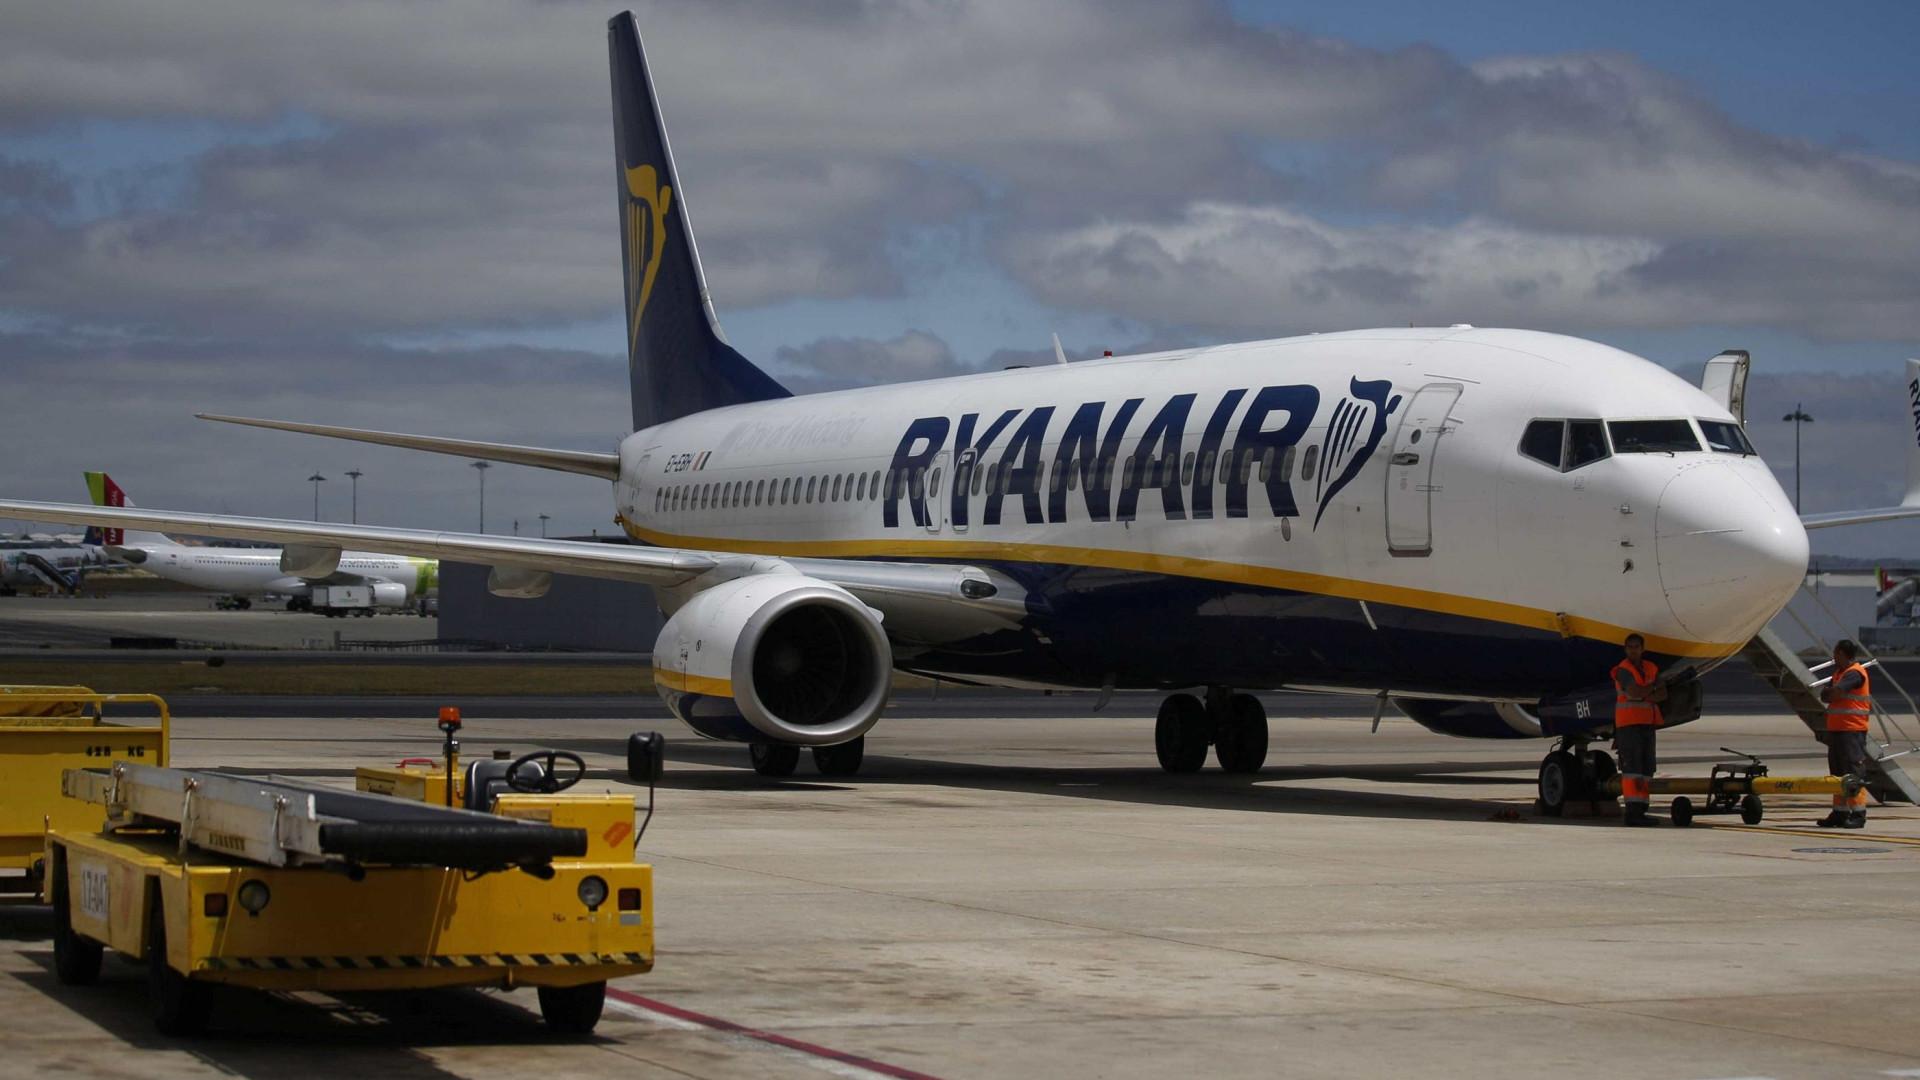 Sindicato dos tripulantes garante que greve da Ryanair na Páscoa avança